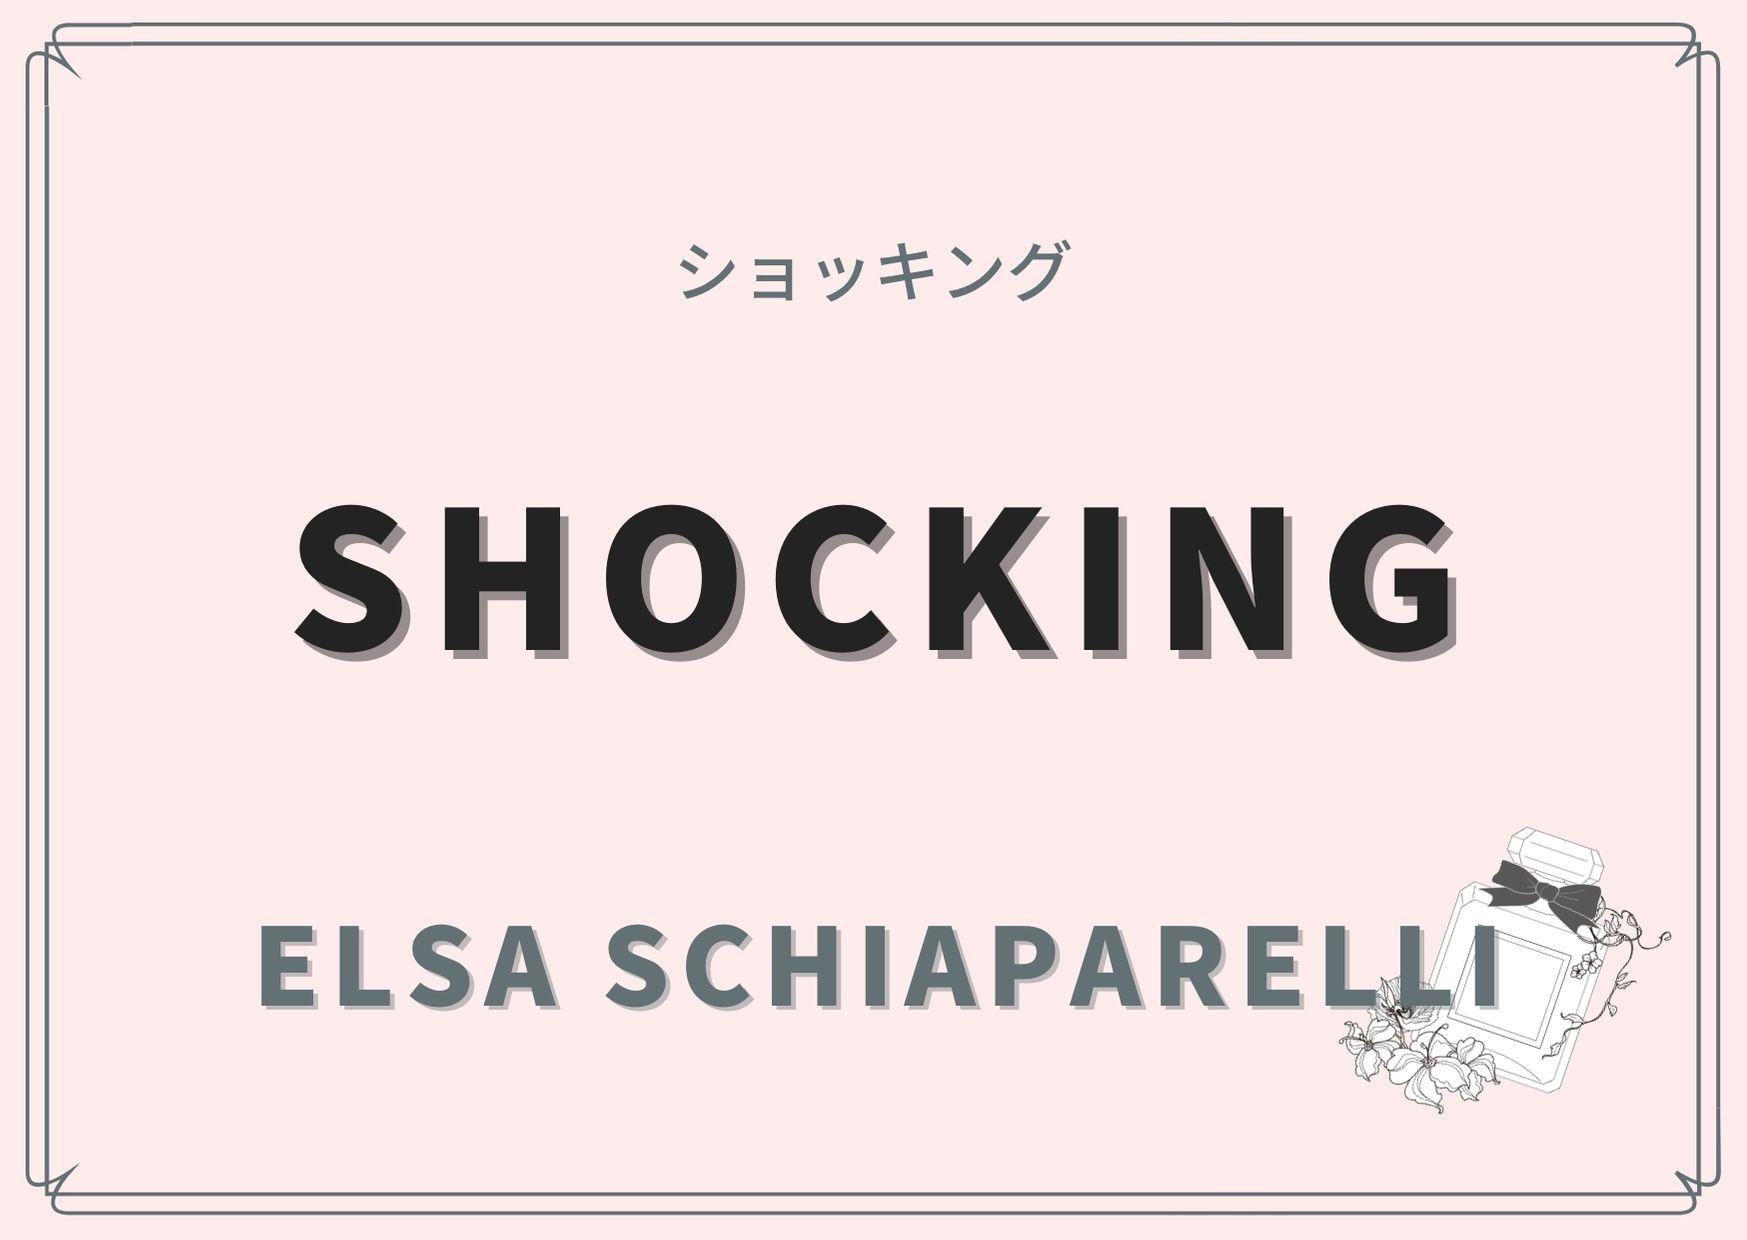 SHOCKING(ショッキング)/ELSA SCHIAPARELLI(エルザ スキャパレッリ)